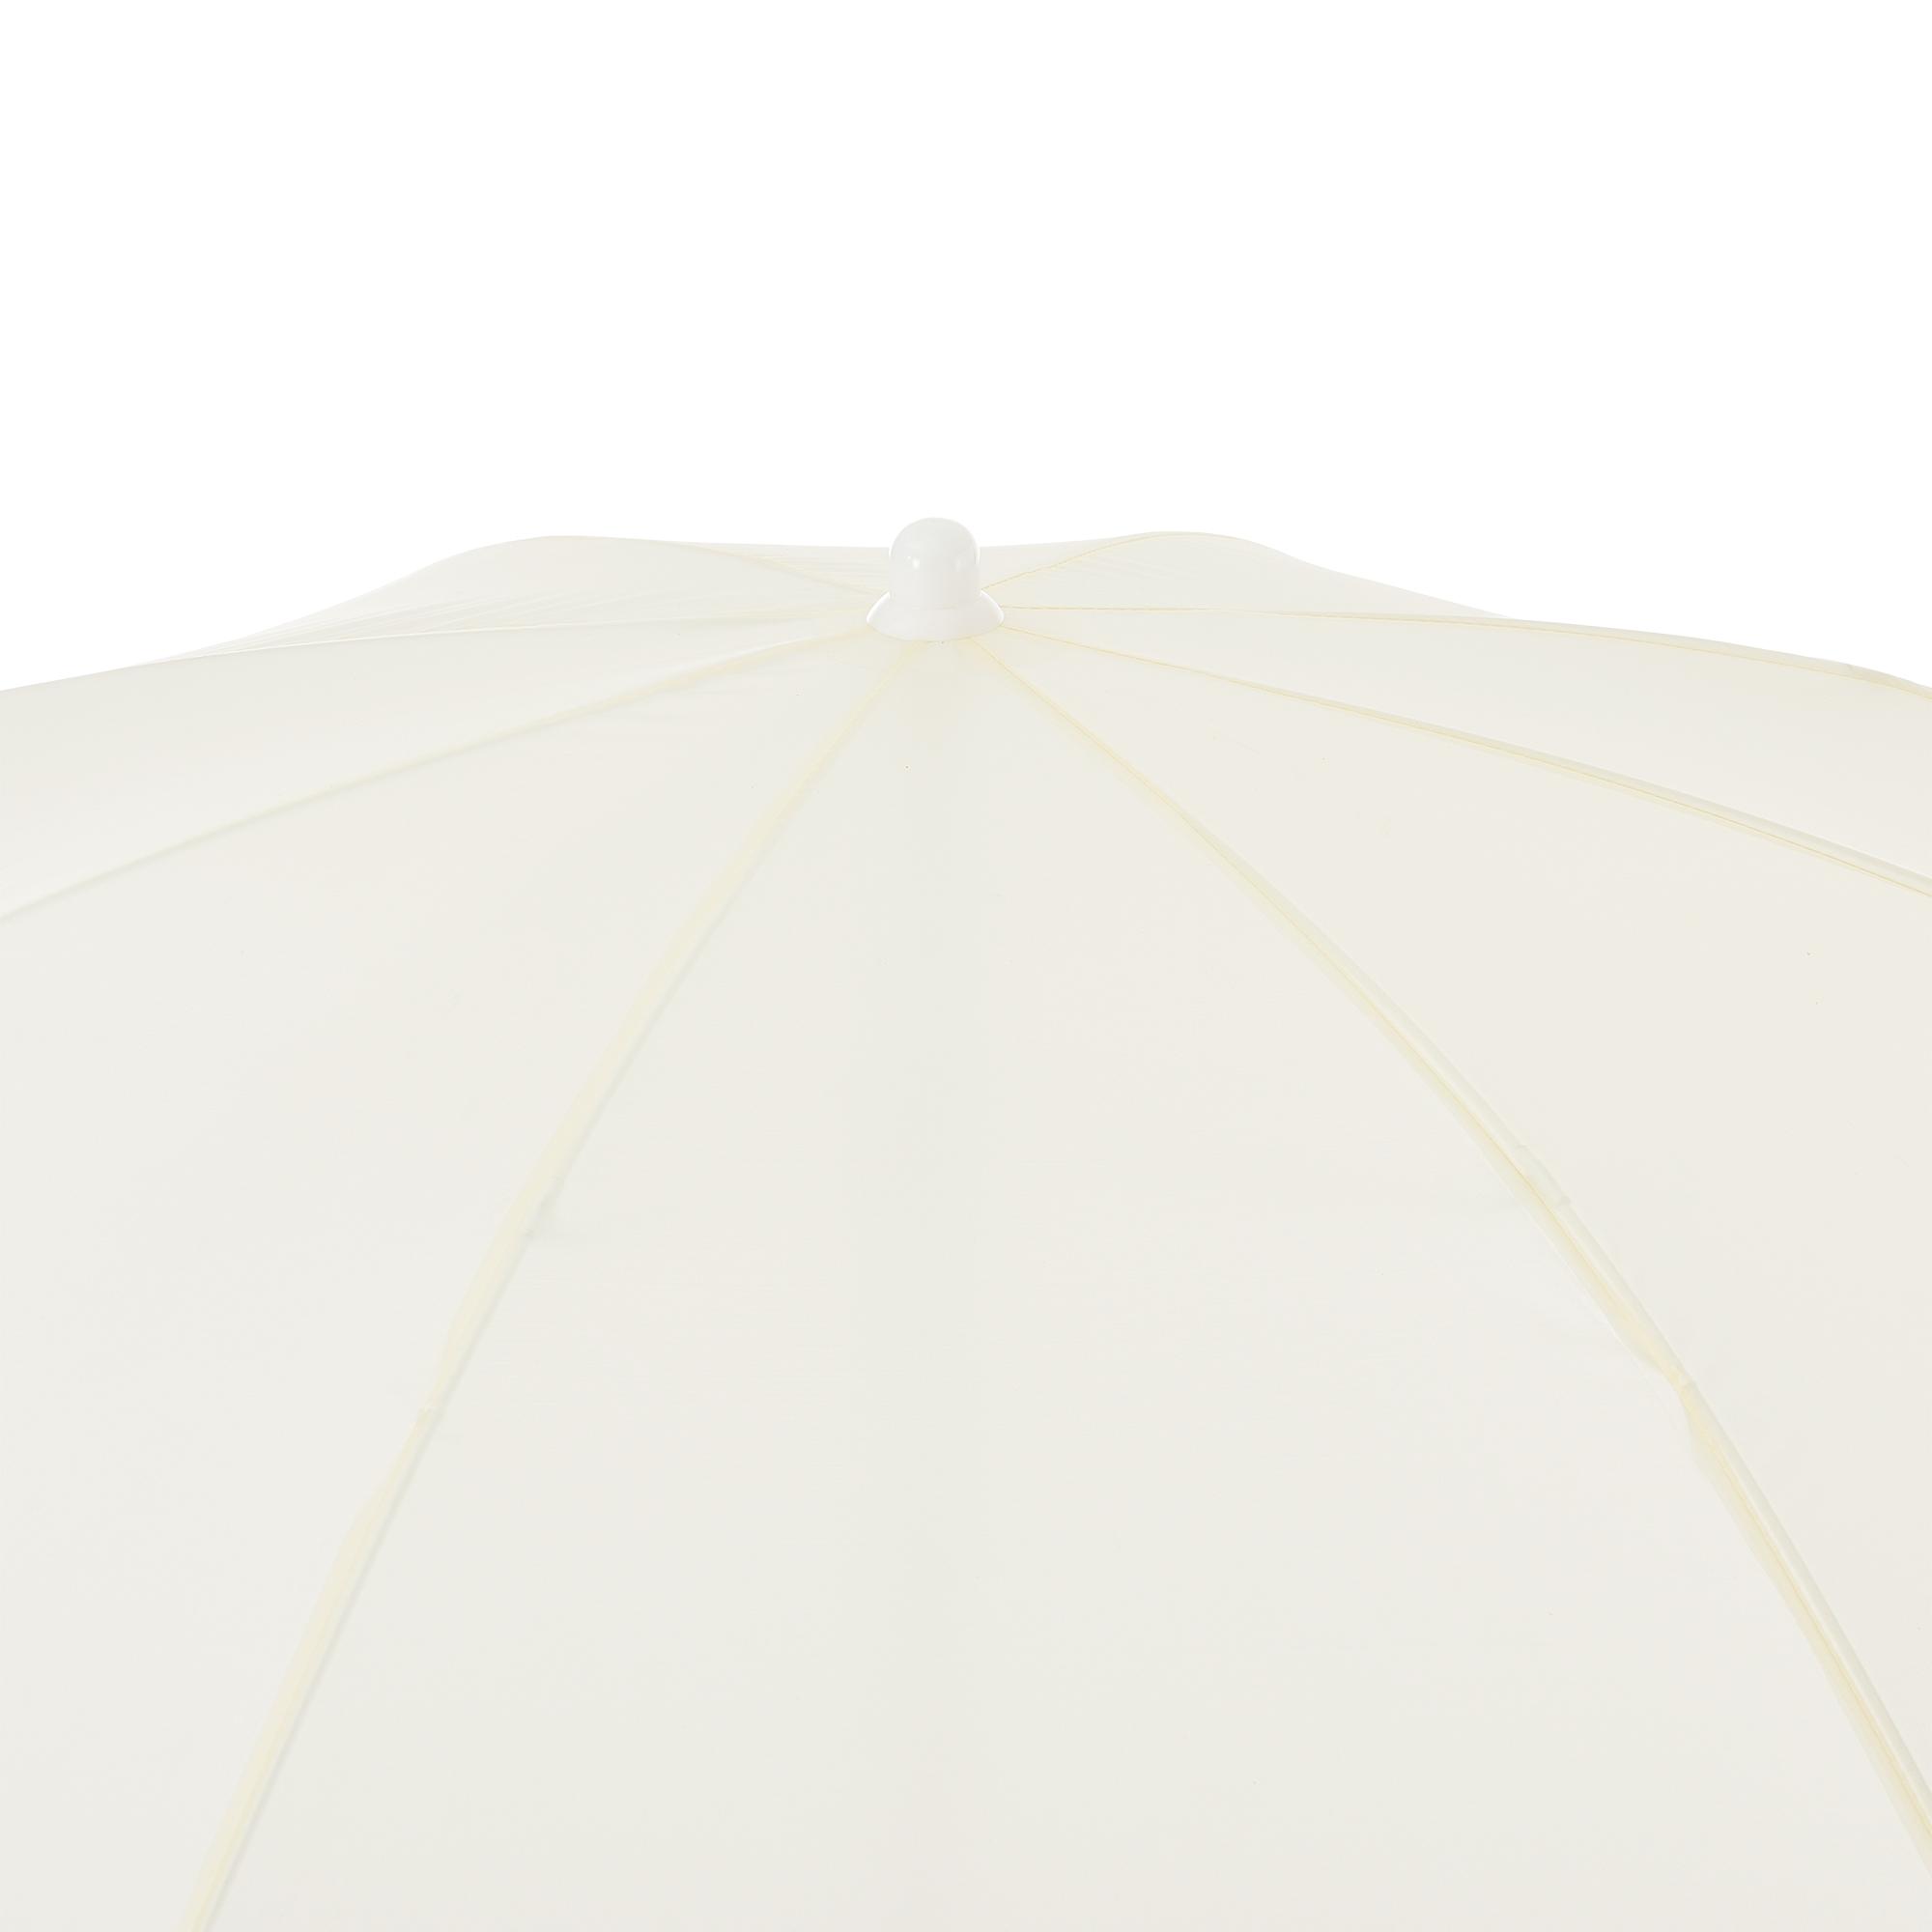 Len Schirm casa pro strandschirm 180cm creme sonnenschirm schirm gartenschirm knickgelenk ebay